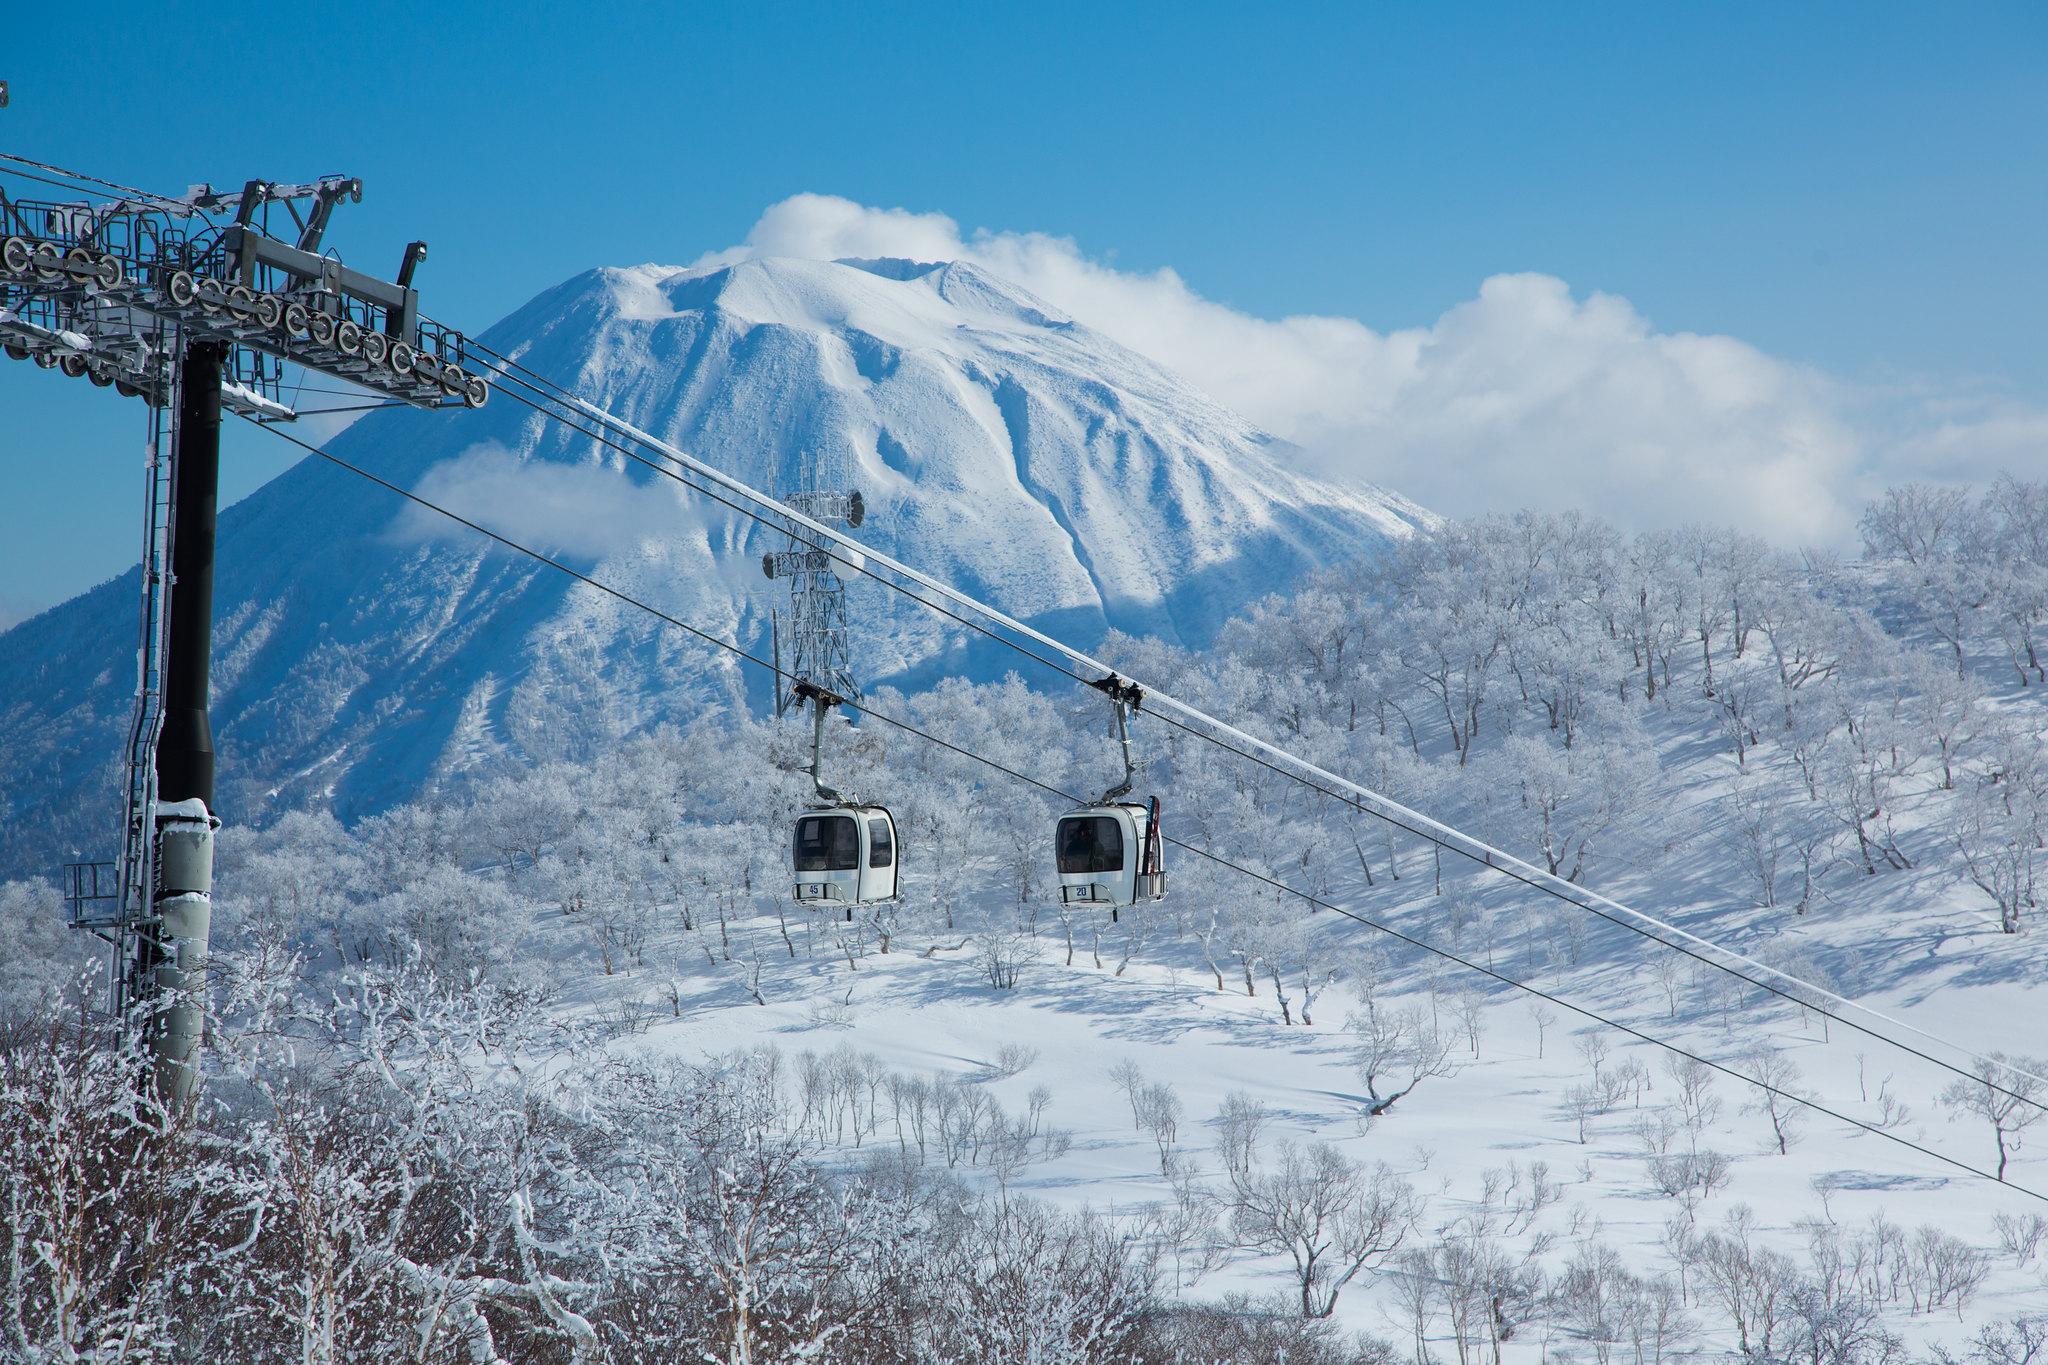 A gondola in Niseko overlooking Mt Yotei on a bluebird day.